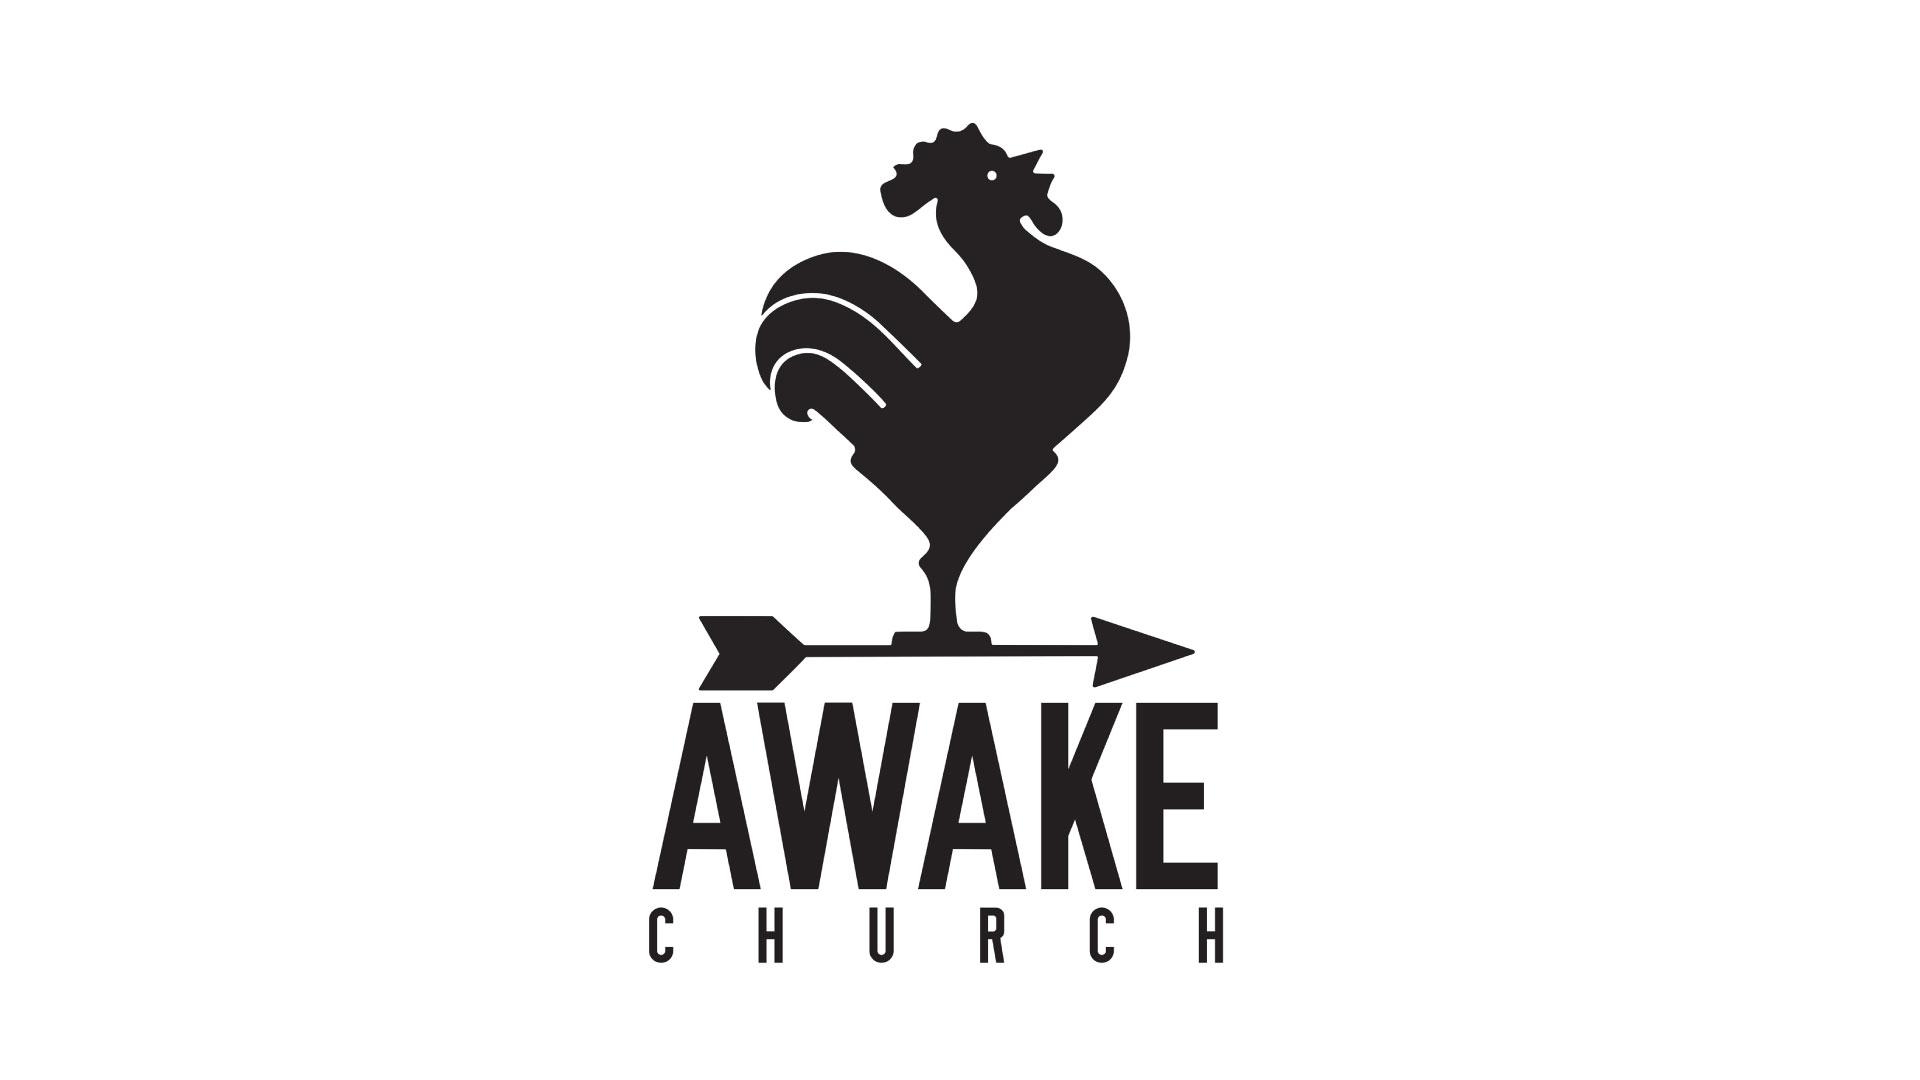 Awake-church-logo.jpg